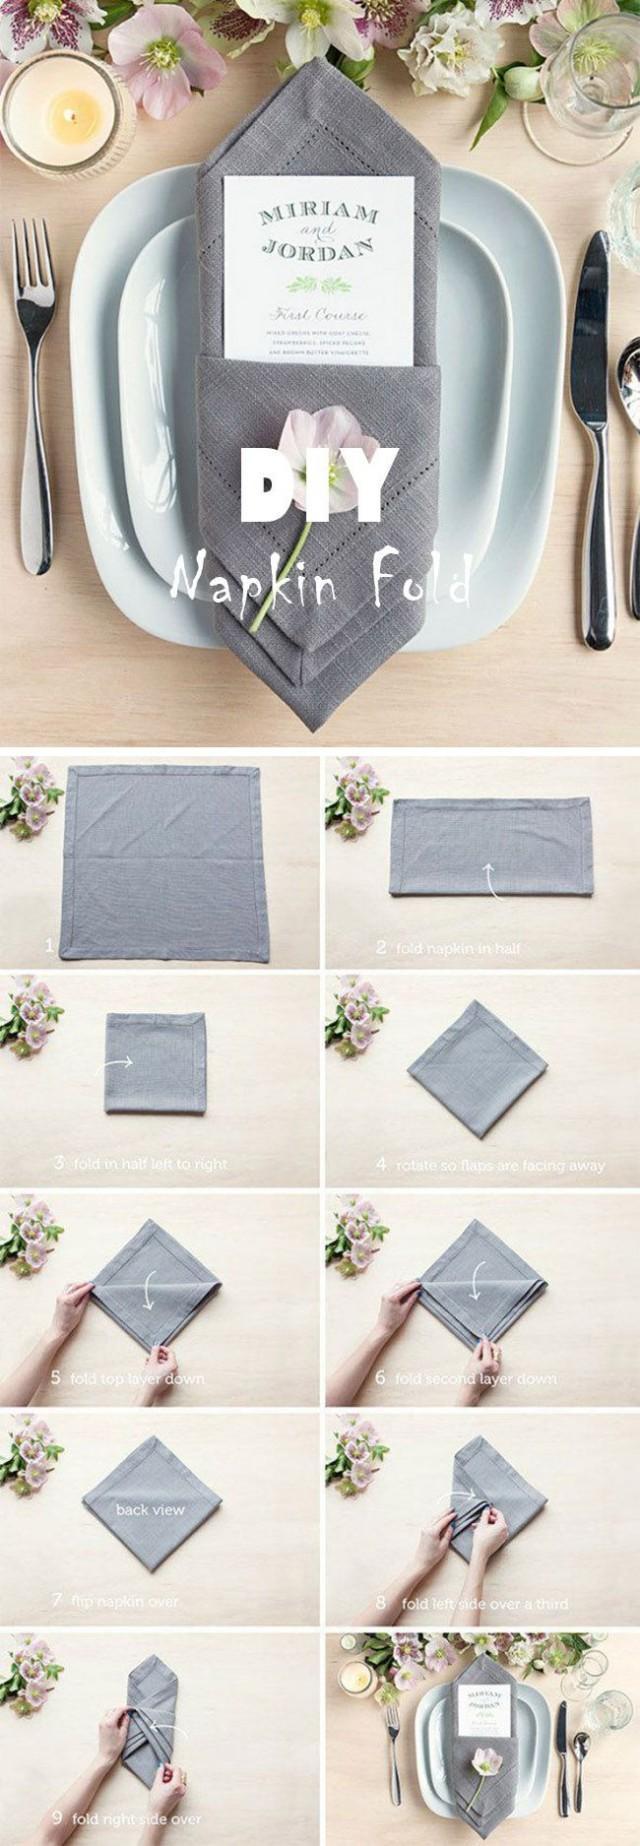 10 Useful DIY Wedding Ideas With Tutorials